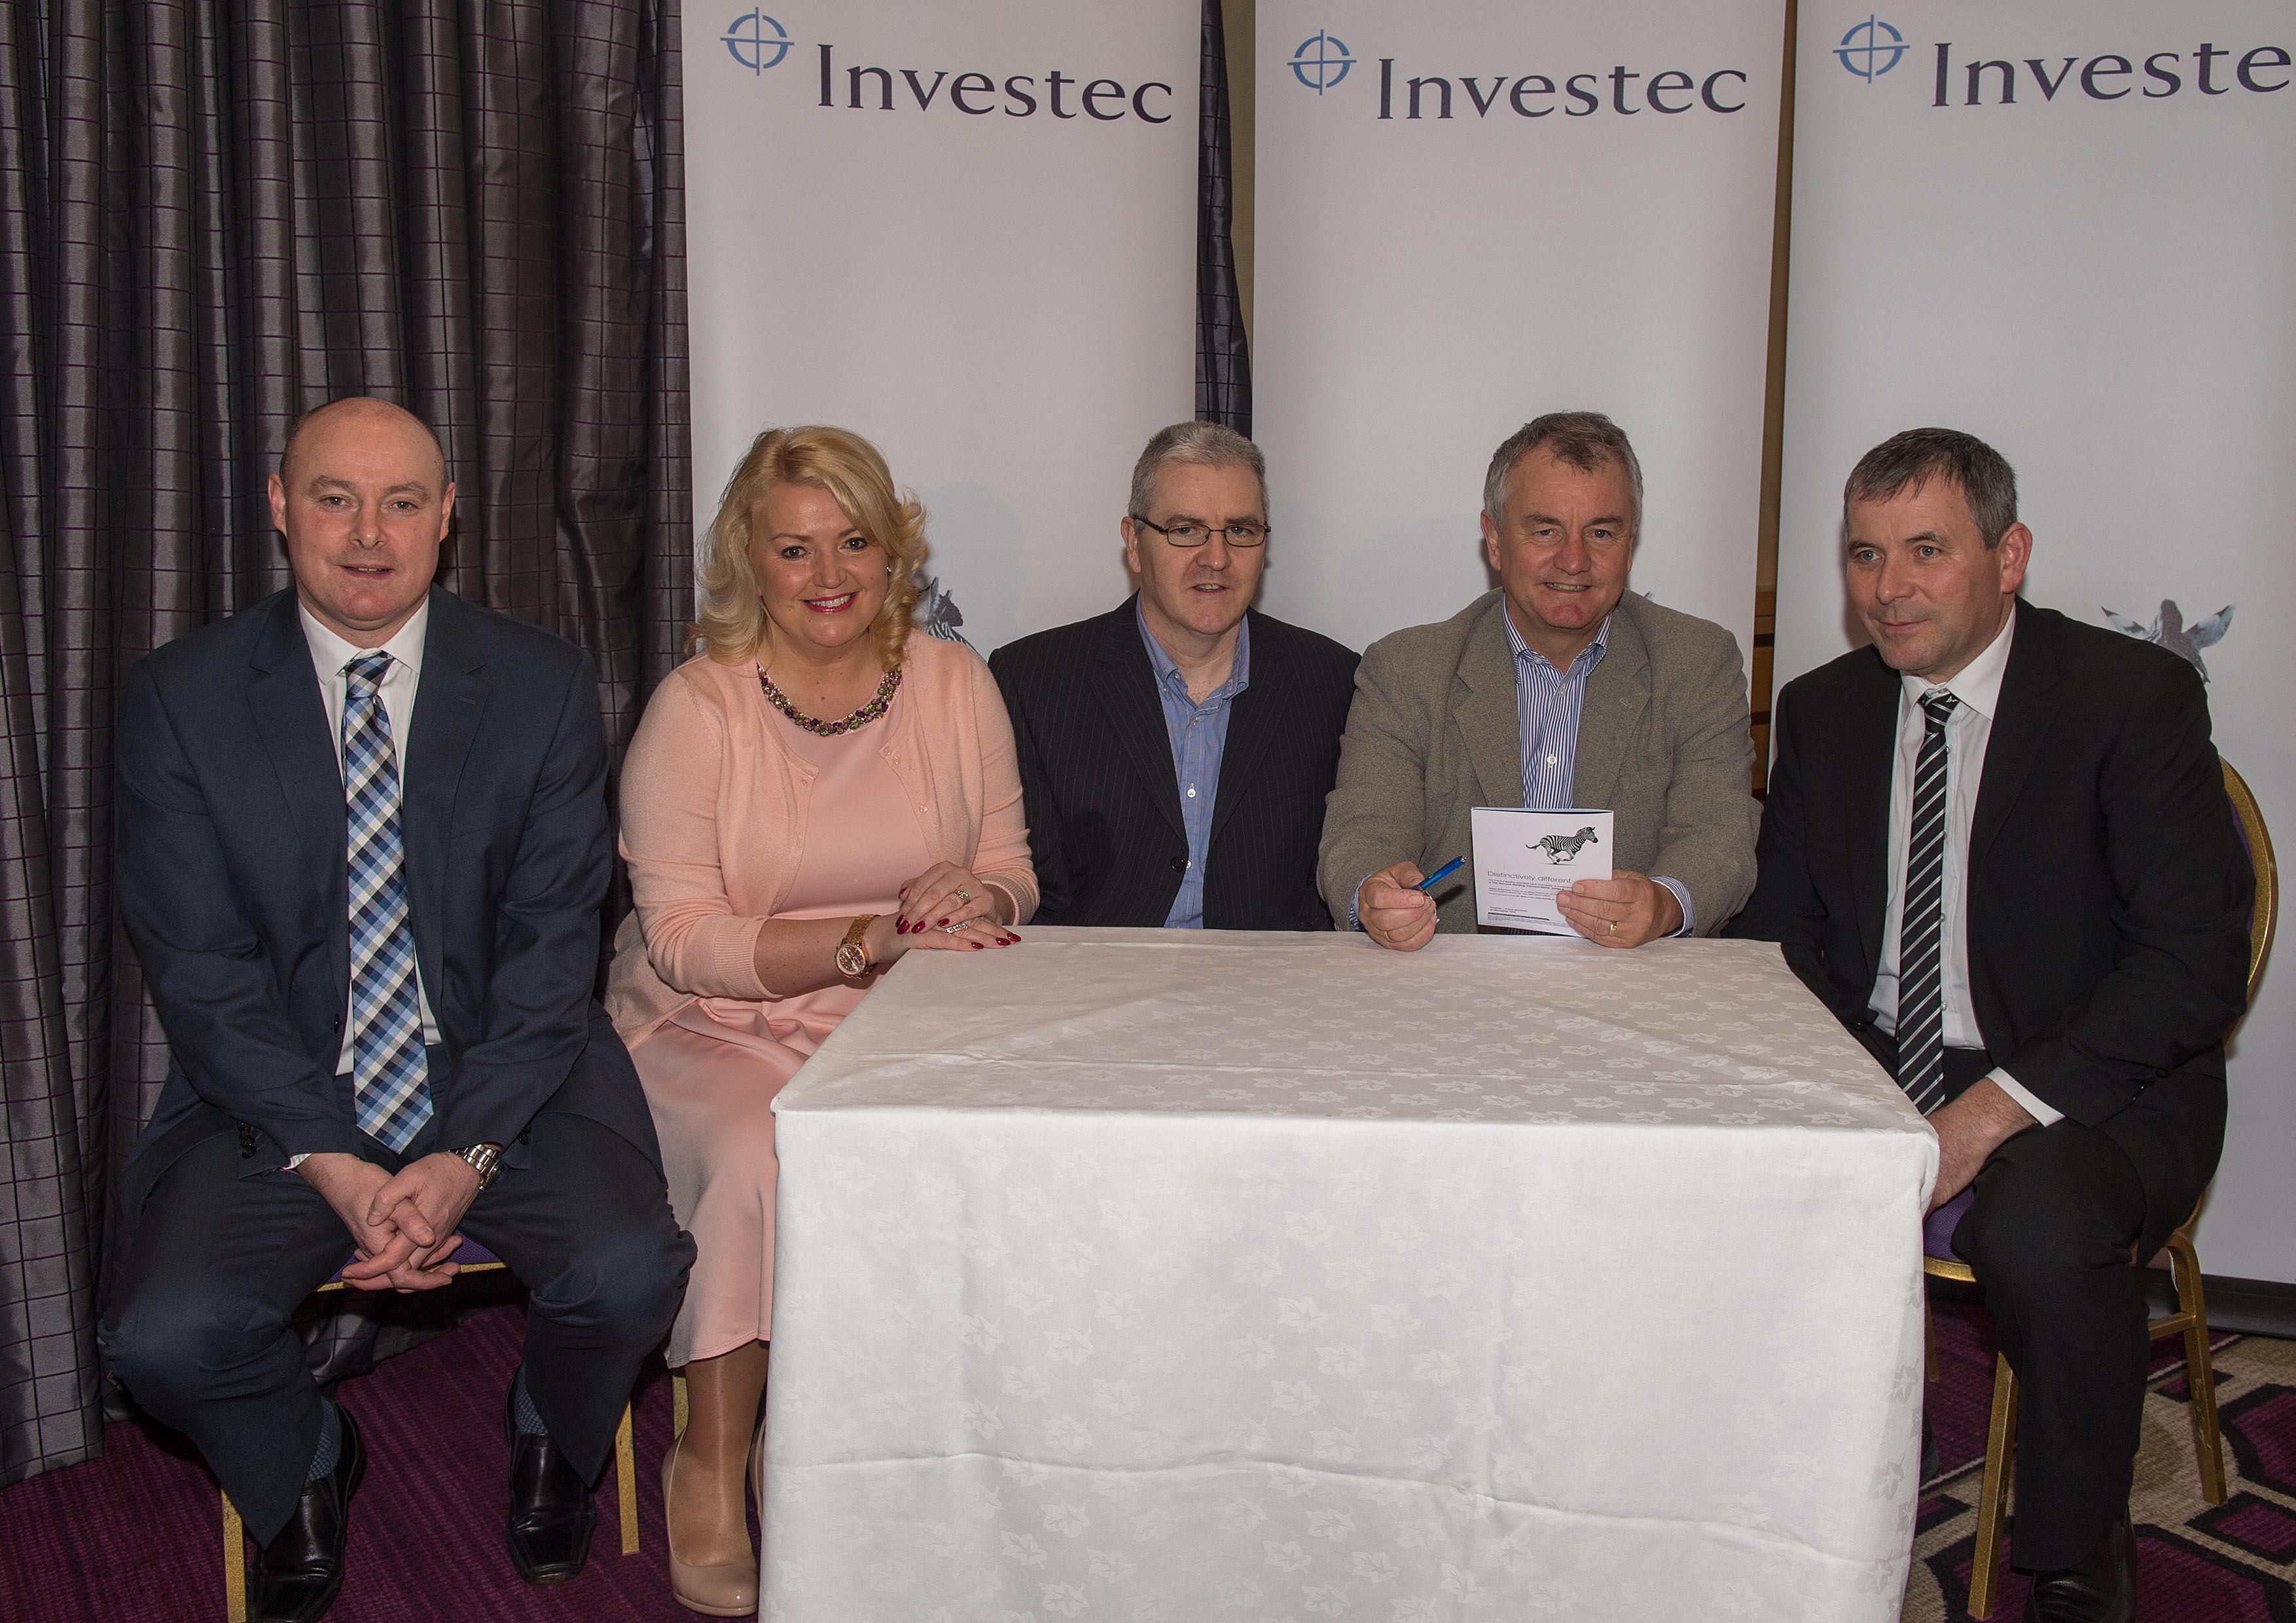 Investec Sponsorship Extension